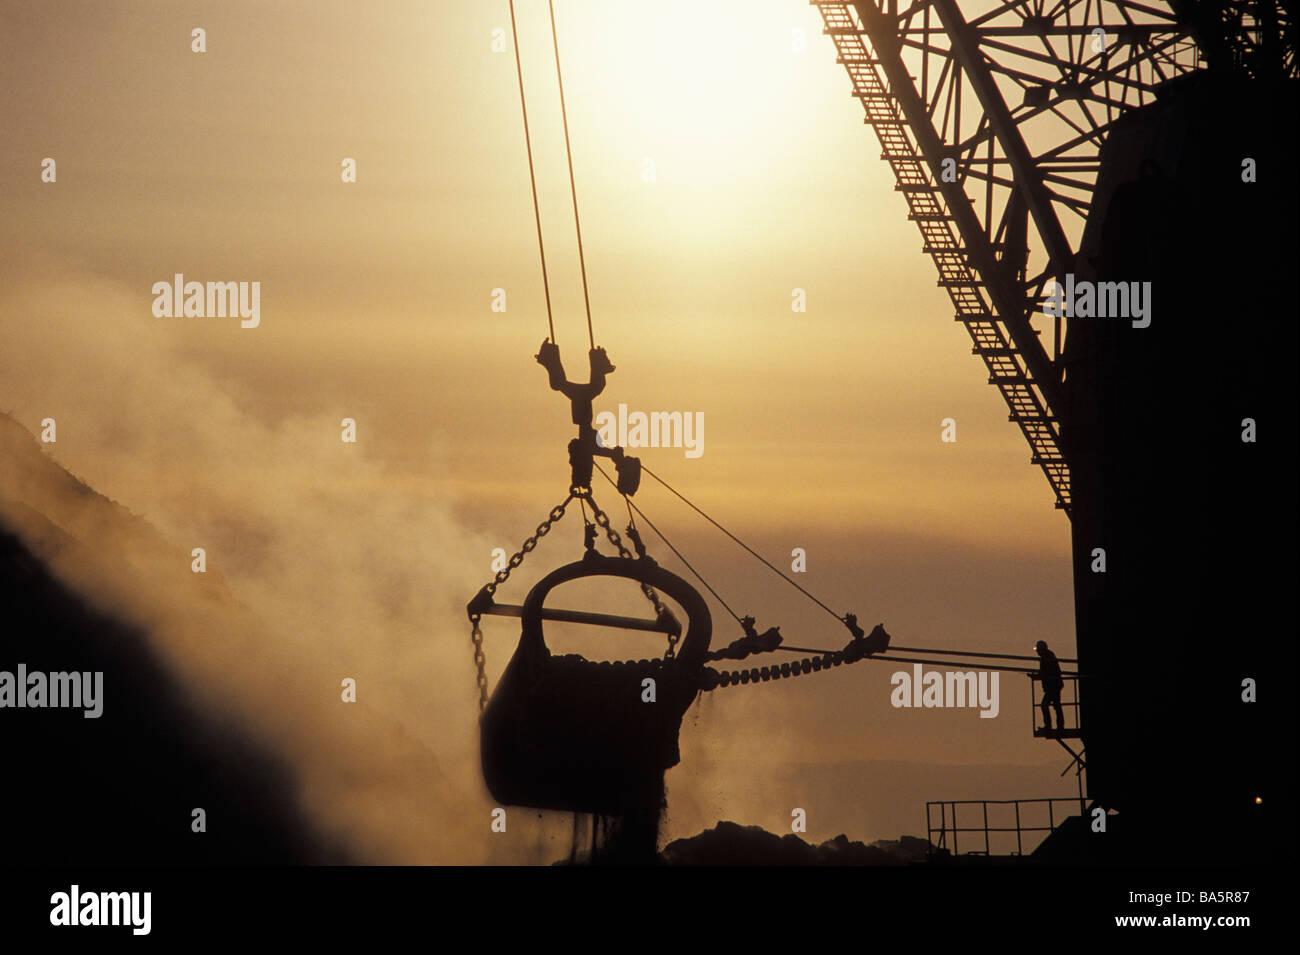 Dragline excavator at coal mine Stock Photo